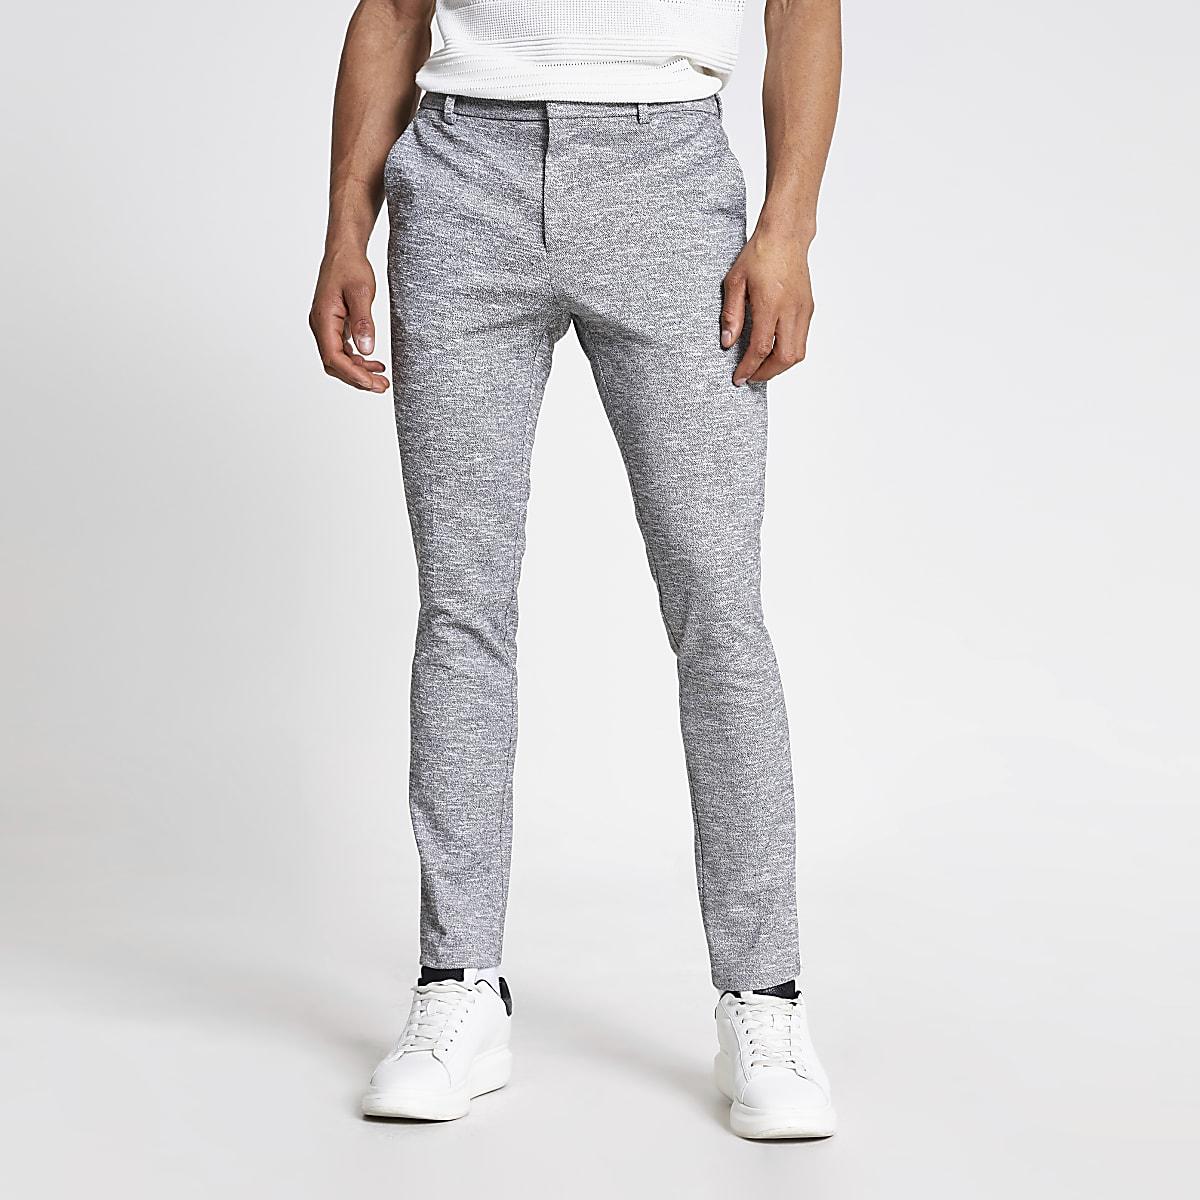 Pantalon habillé ultraskinny texturé gris